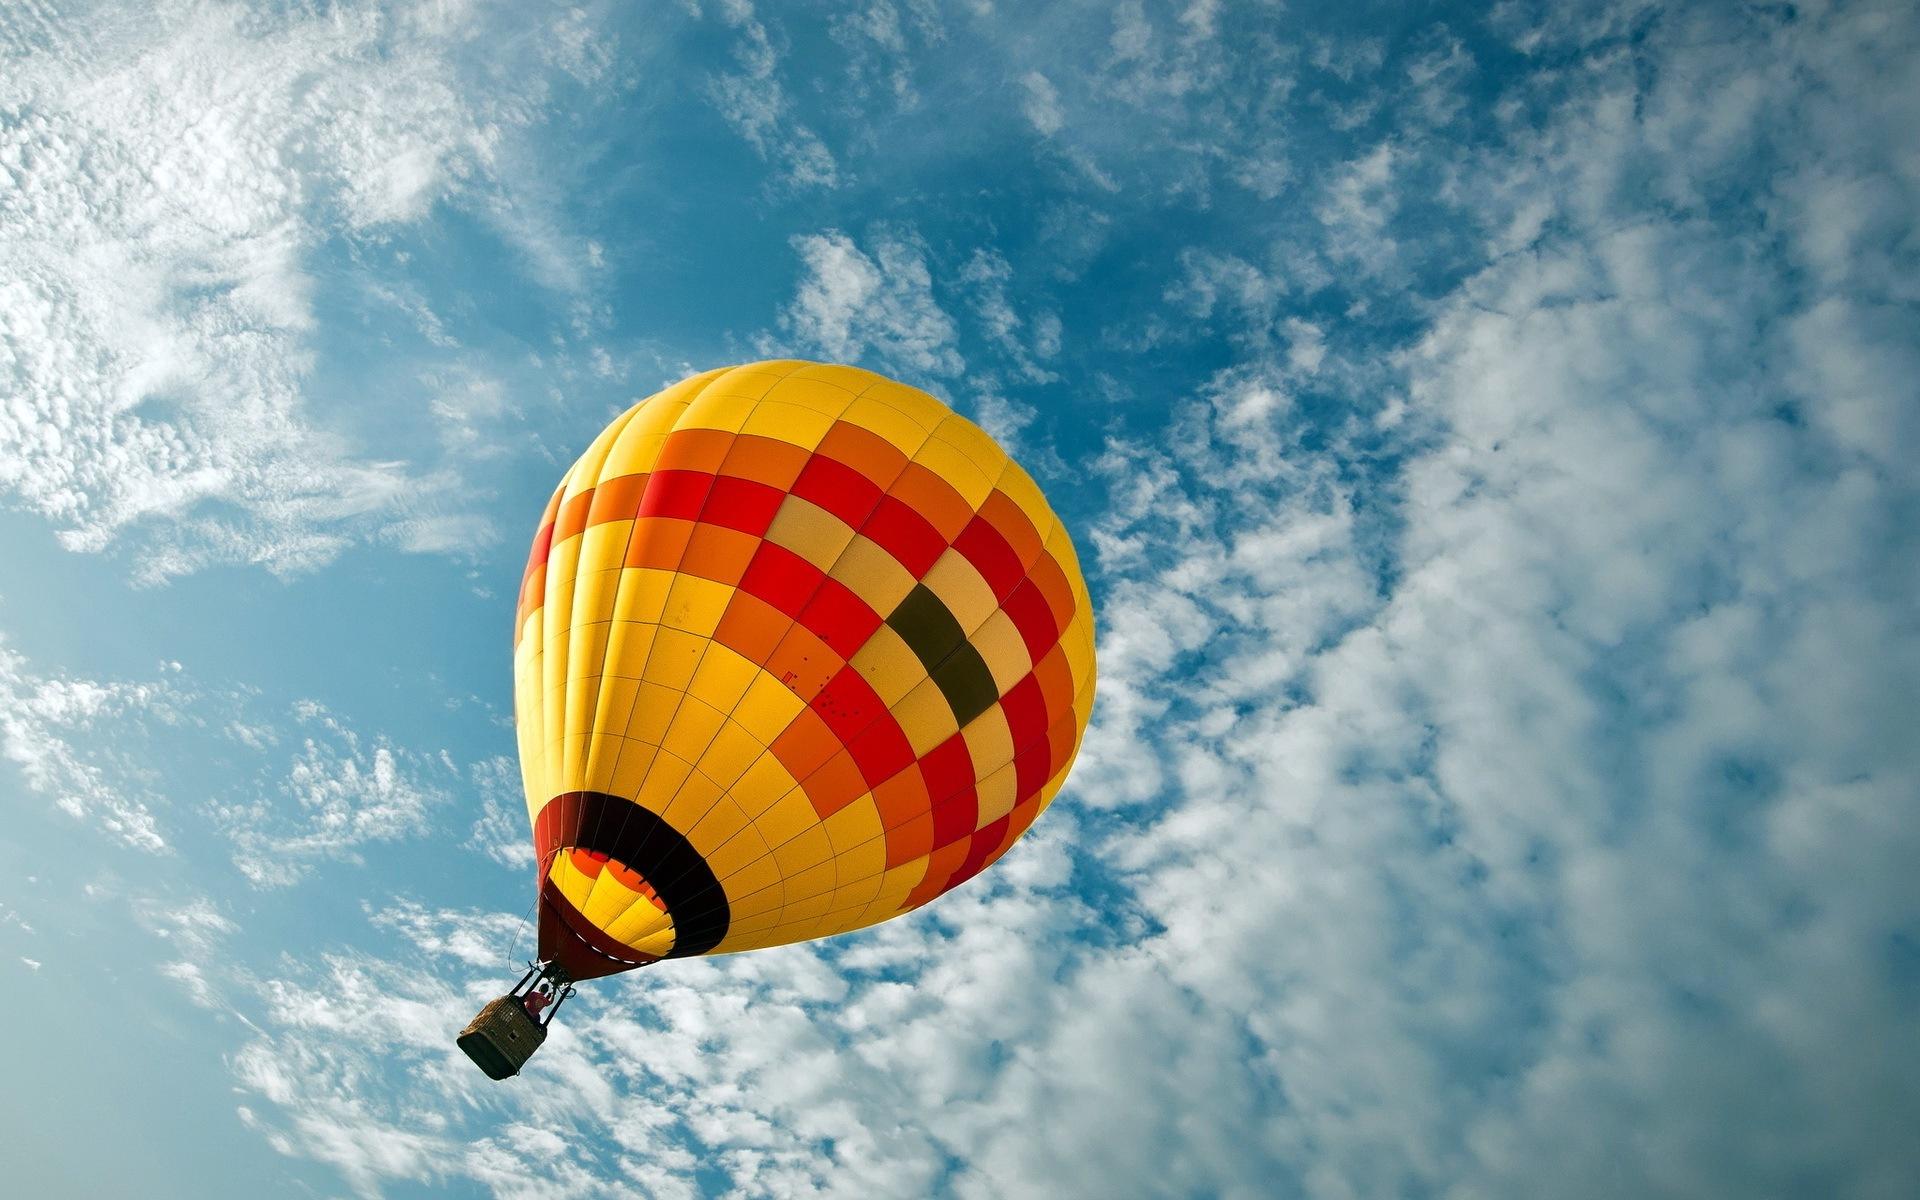 HD Hot Air Balloon Wallpaper - WallpaperSafari